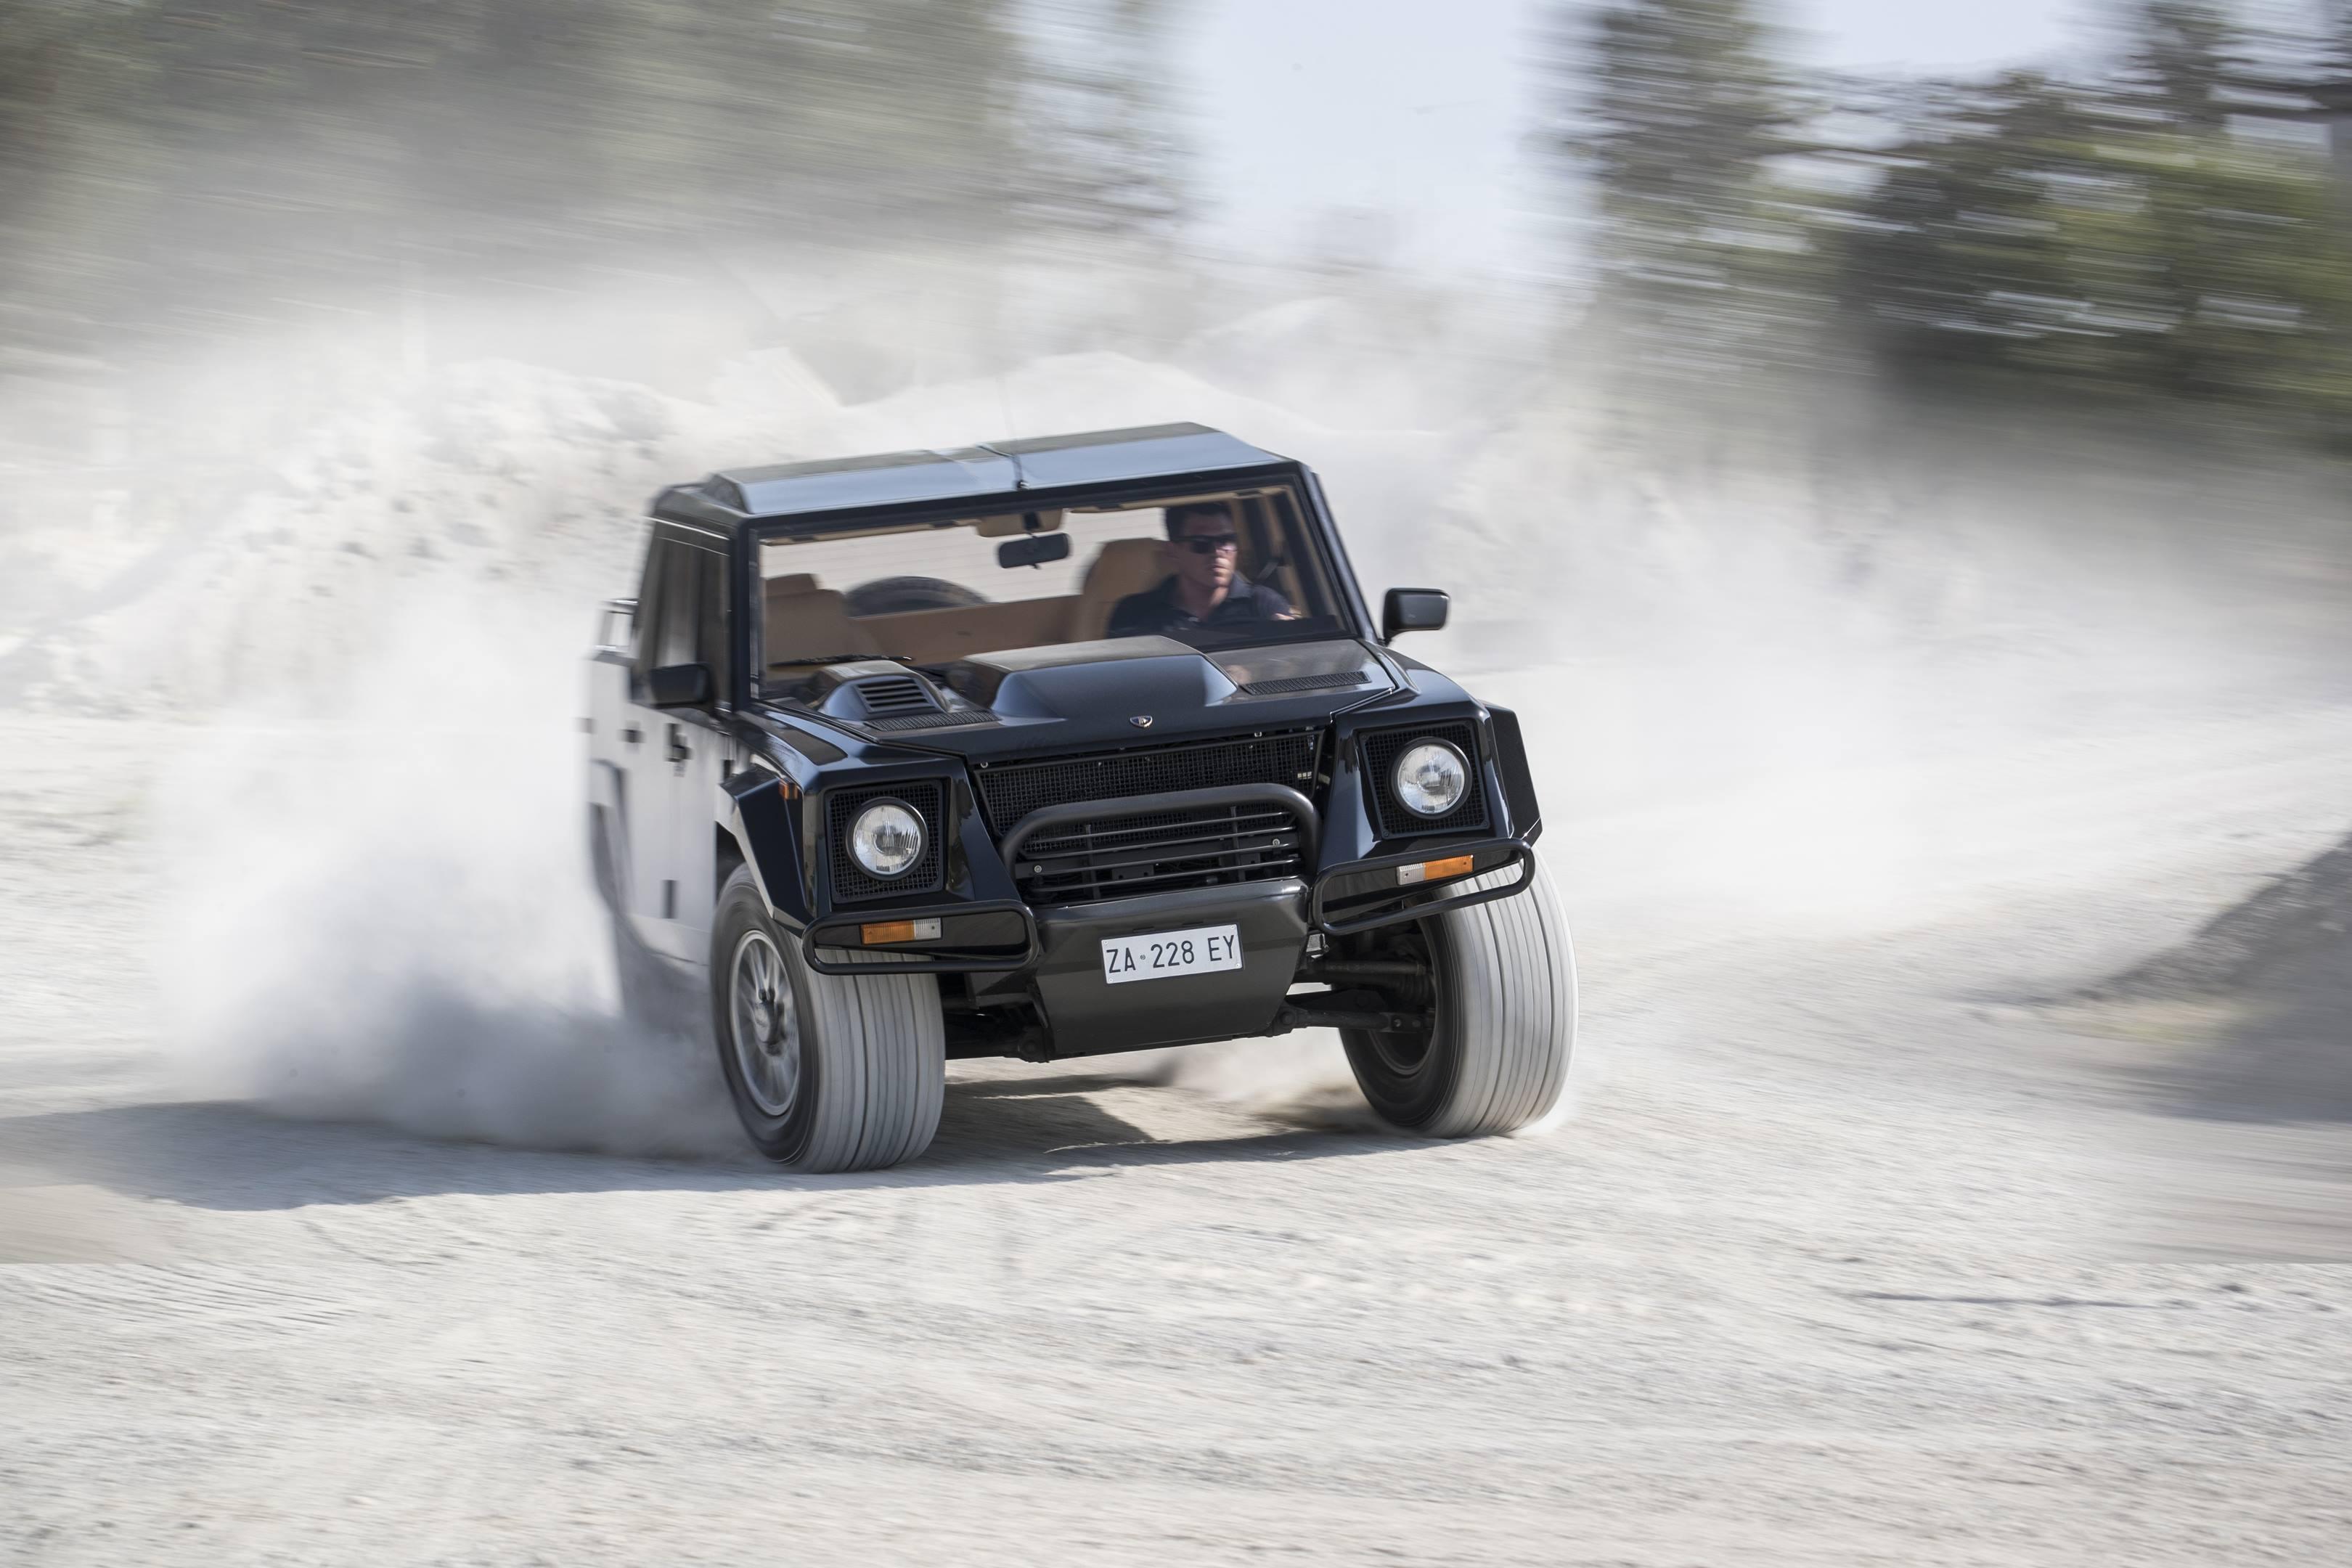 Lamborghini LM002 on dirt